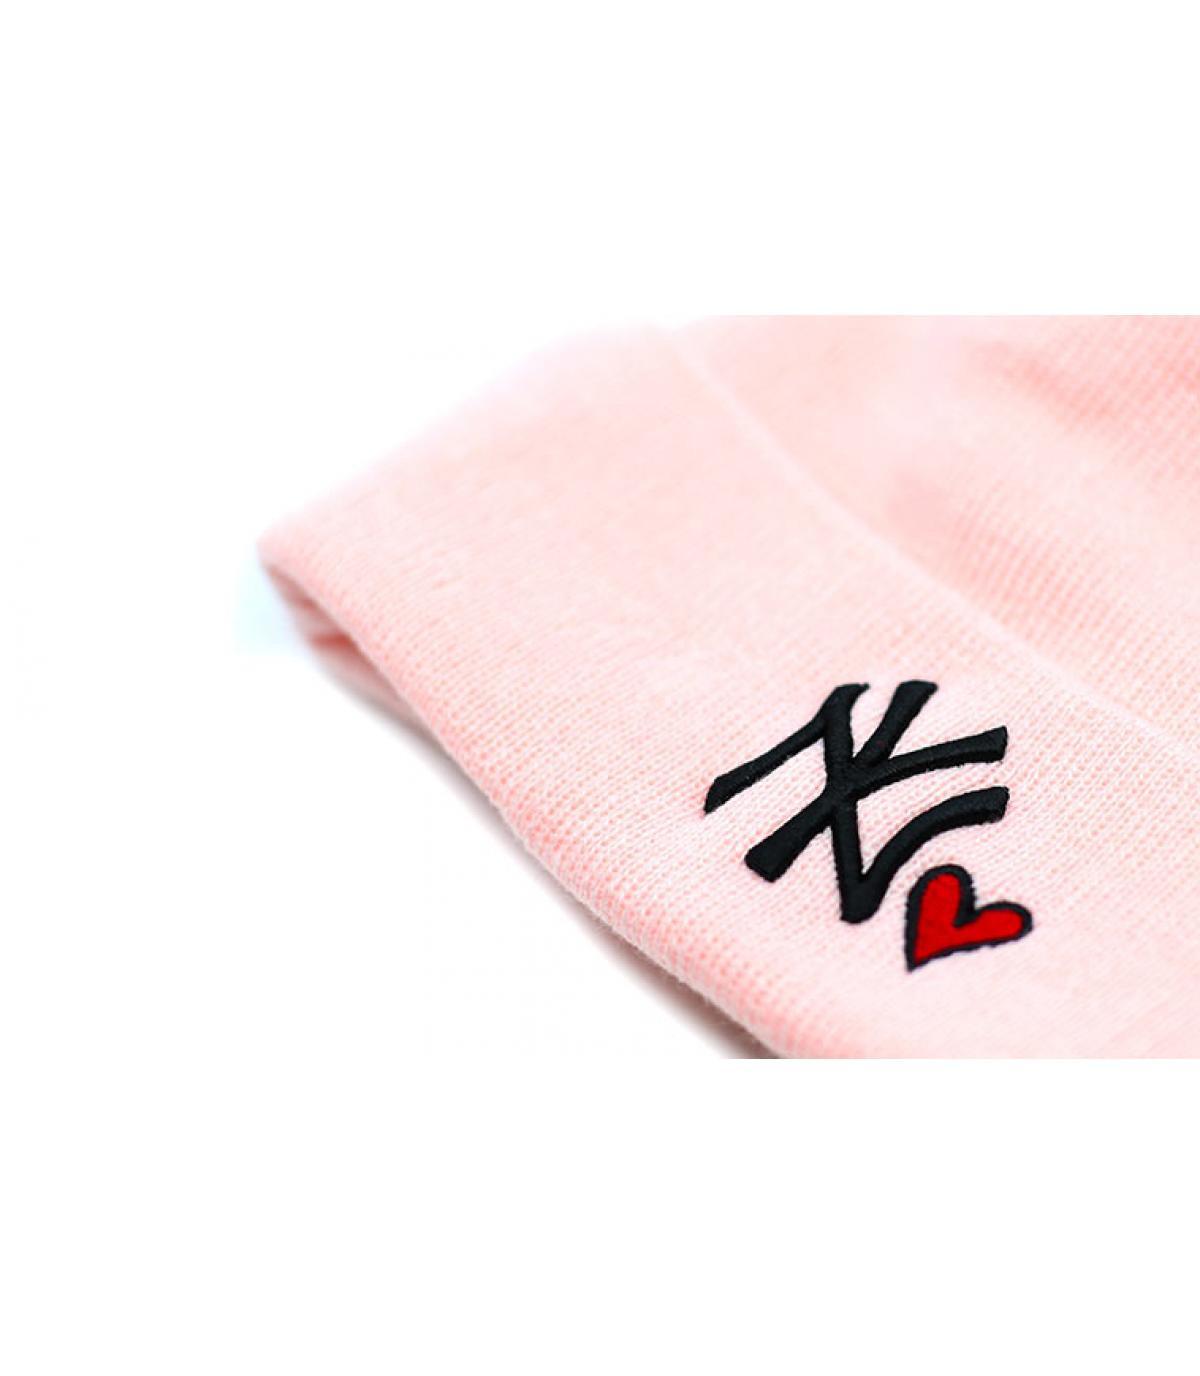 Détails Wmns Heart NY knit pink - image 3